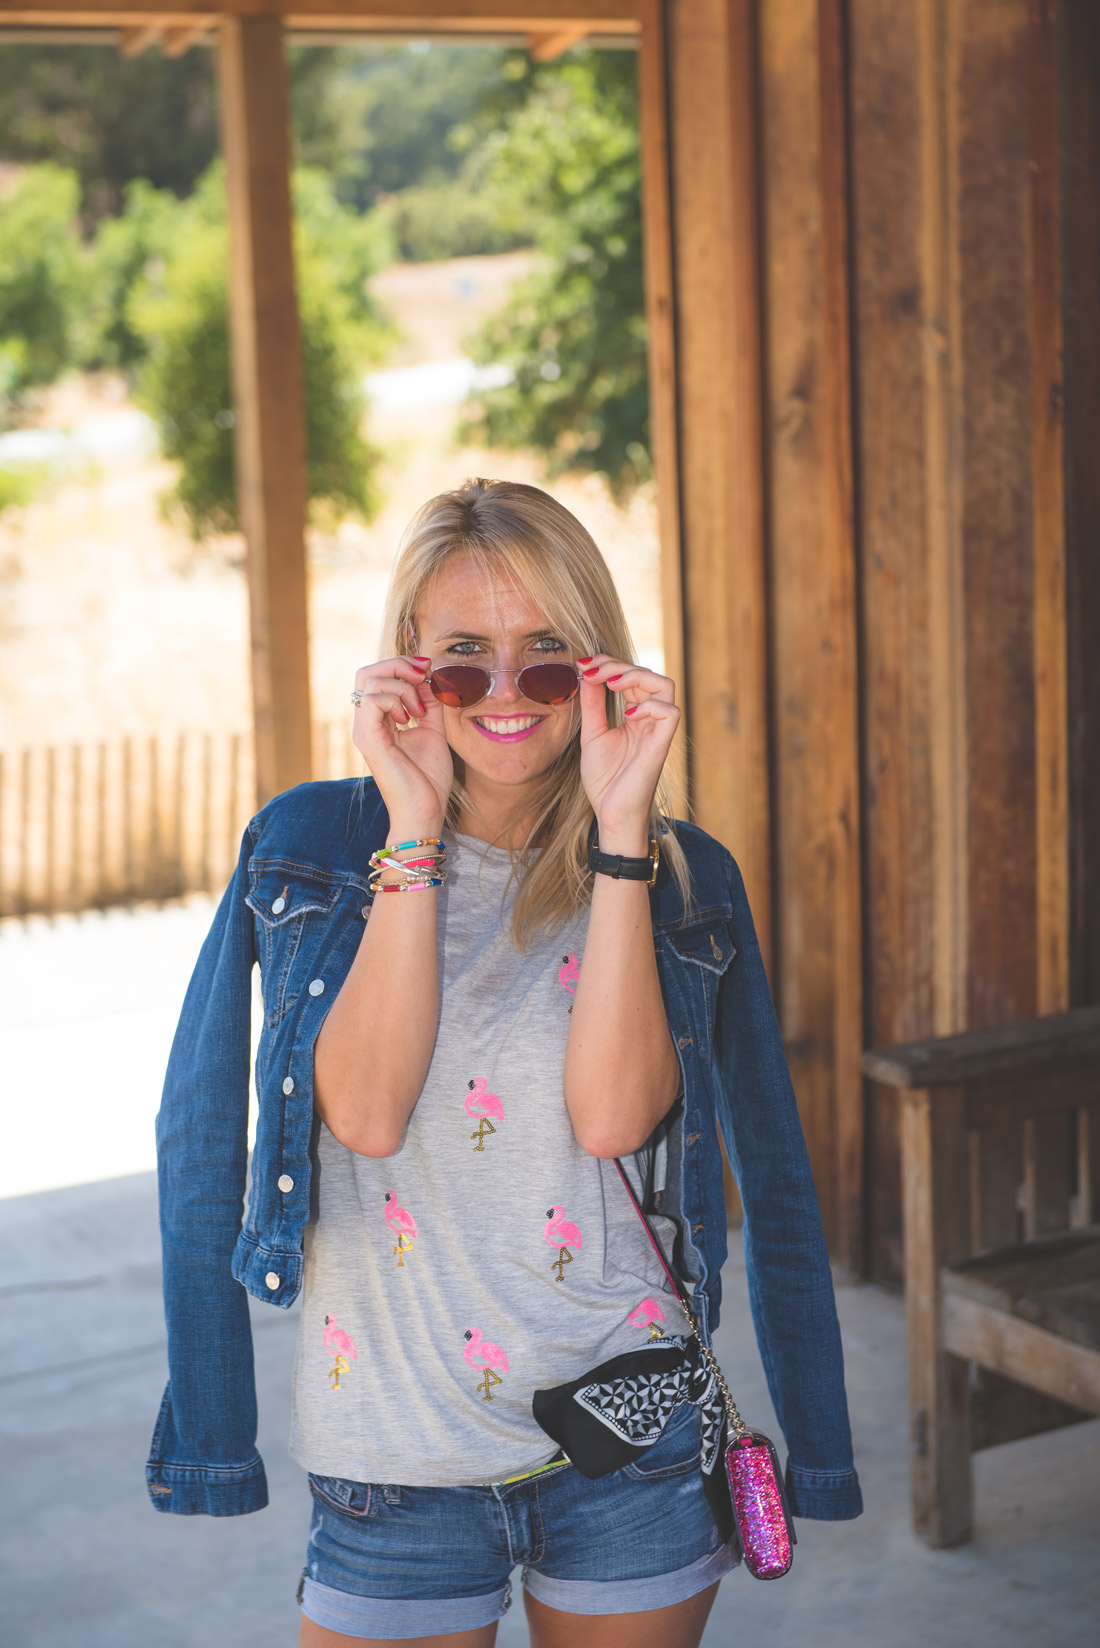 Bag-at-you---Fashion-blog---Polette-sunglasses---California-design